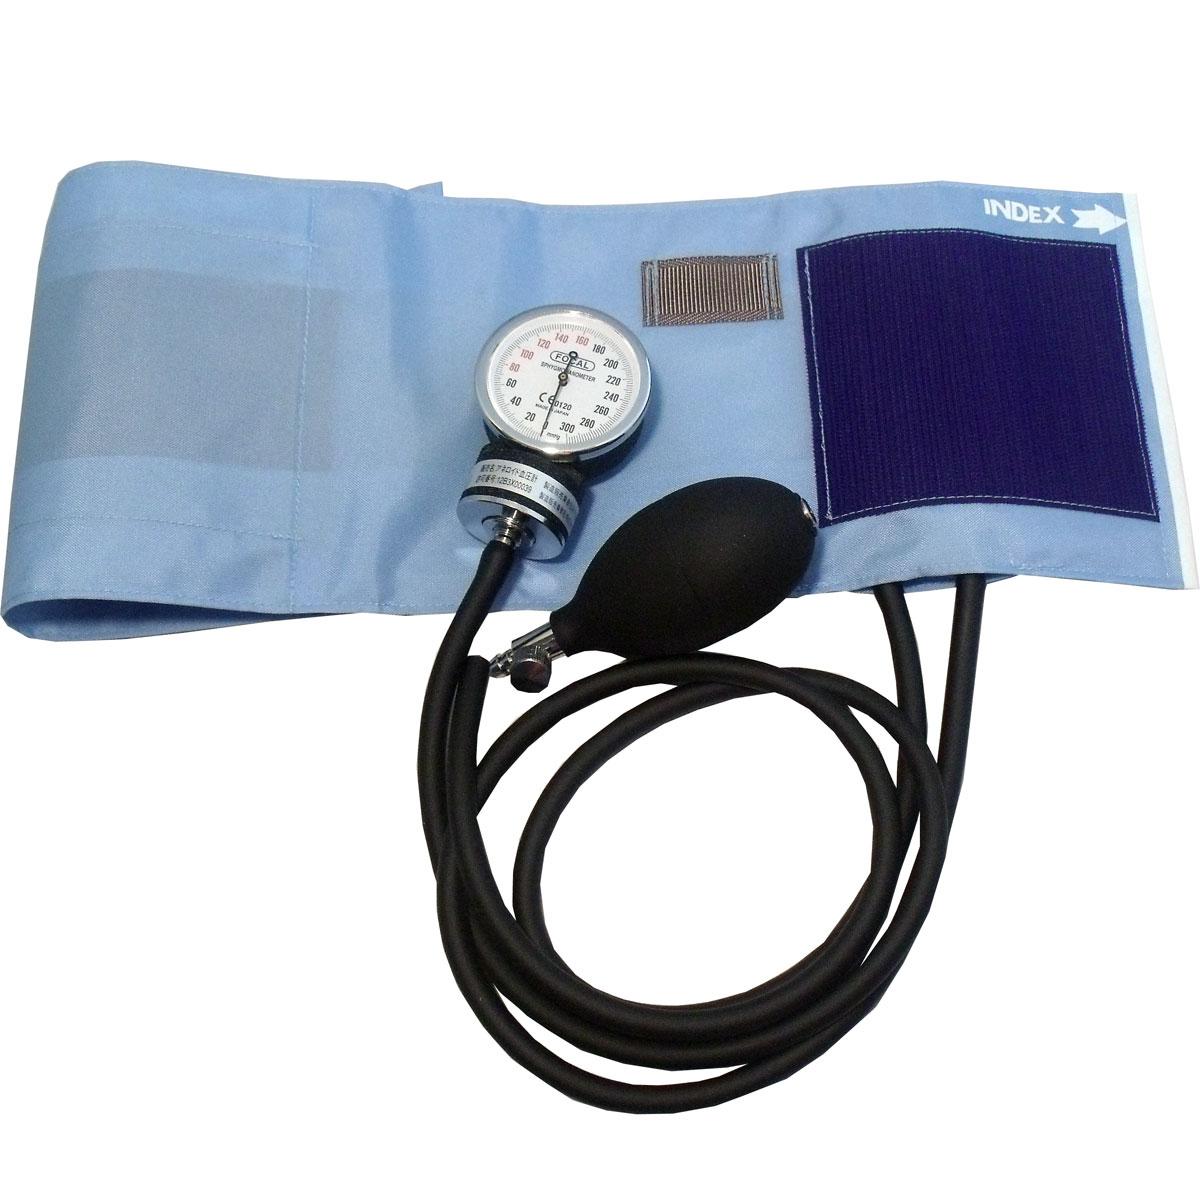 FOCAL アネロイド血圧計 FC-100V ナイロンカフ スカイブルー